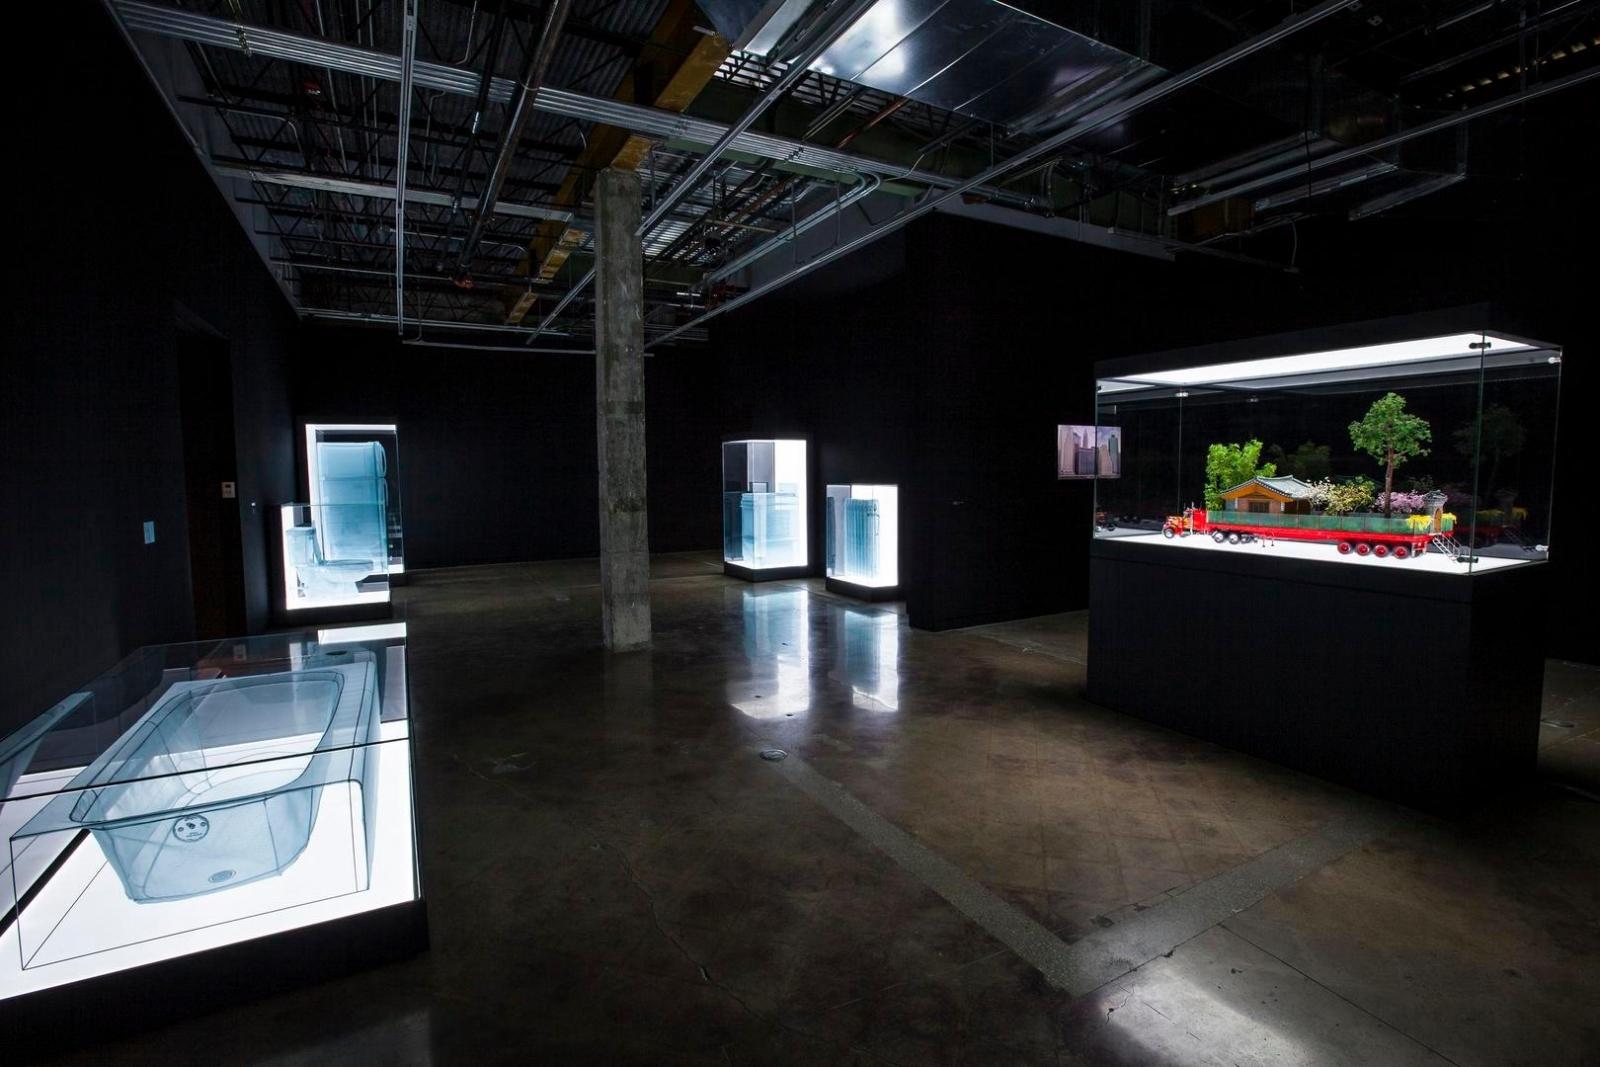 Installation view, Do Ho Suh, The Contemporary Austin – Jones Center